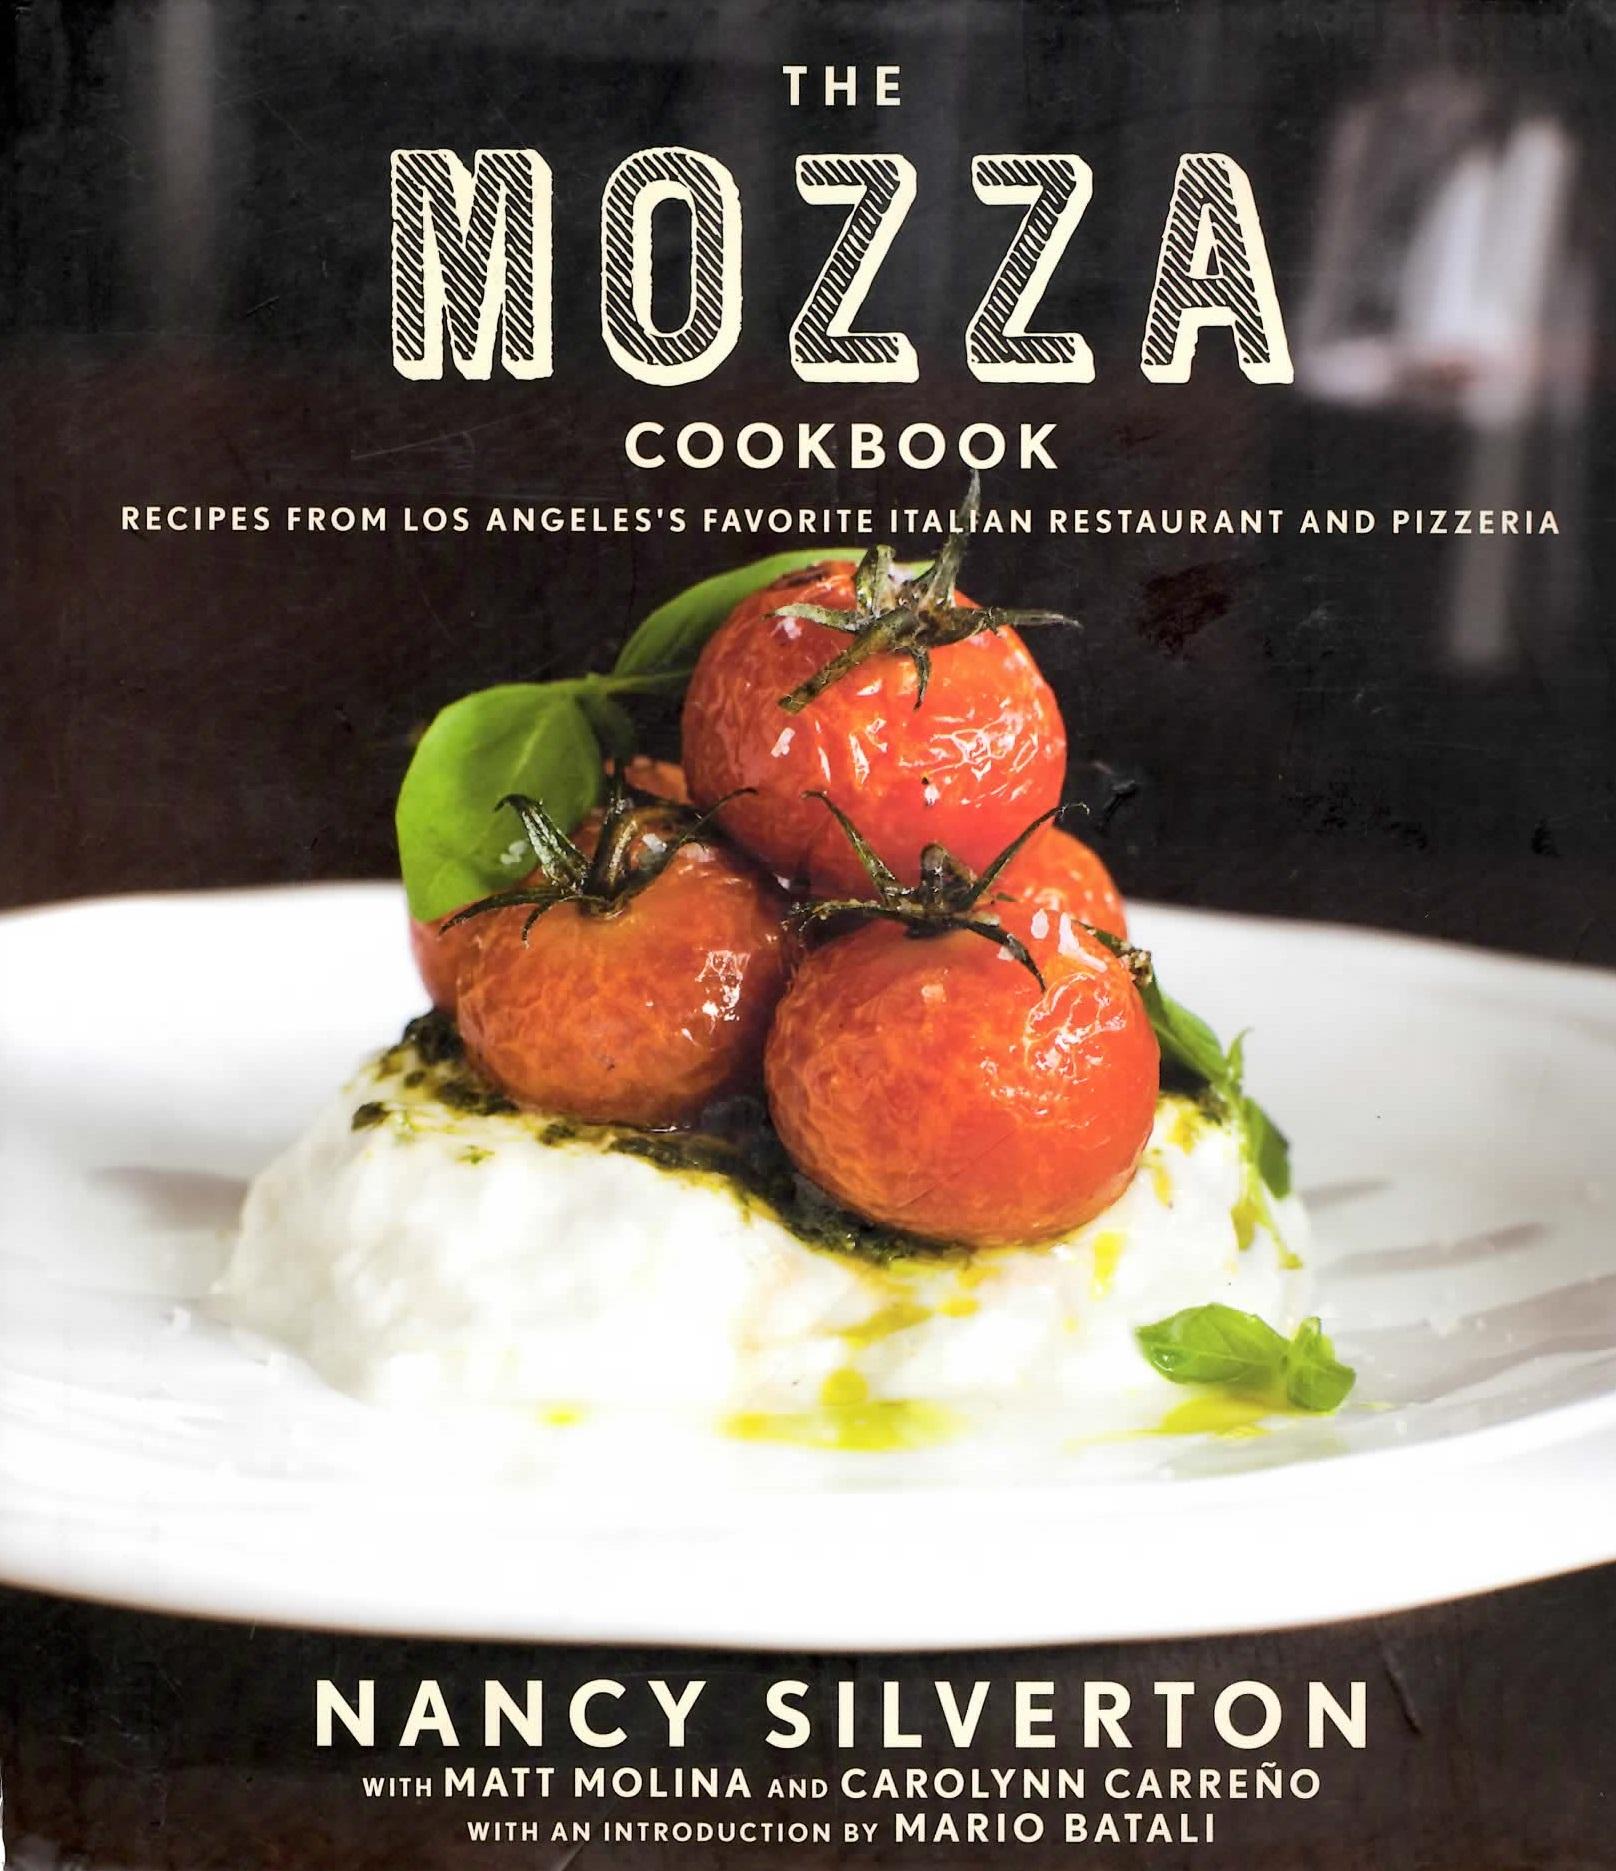 MozzaCookbook.JPG